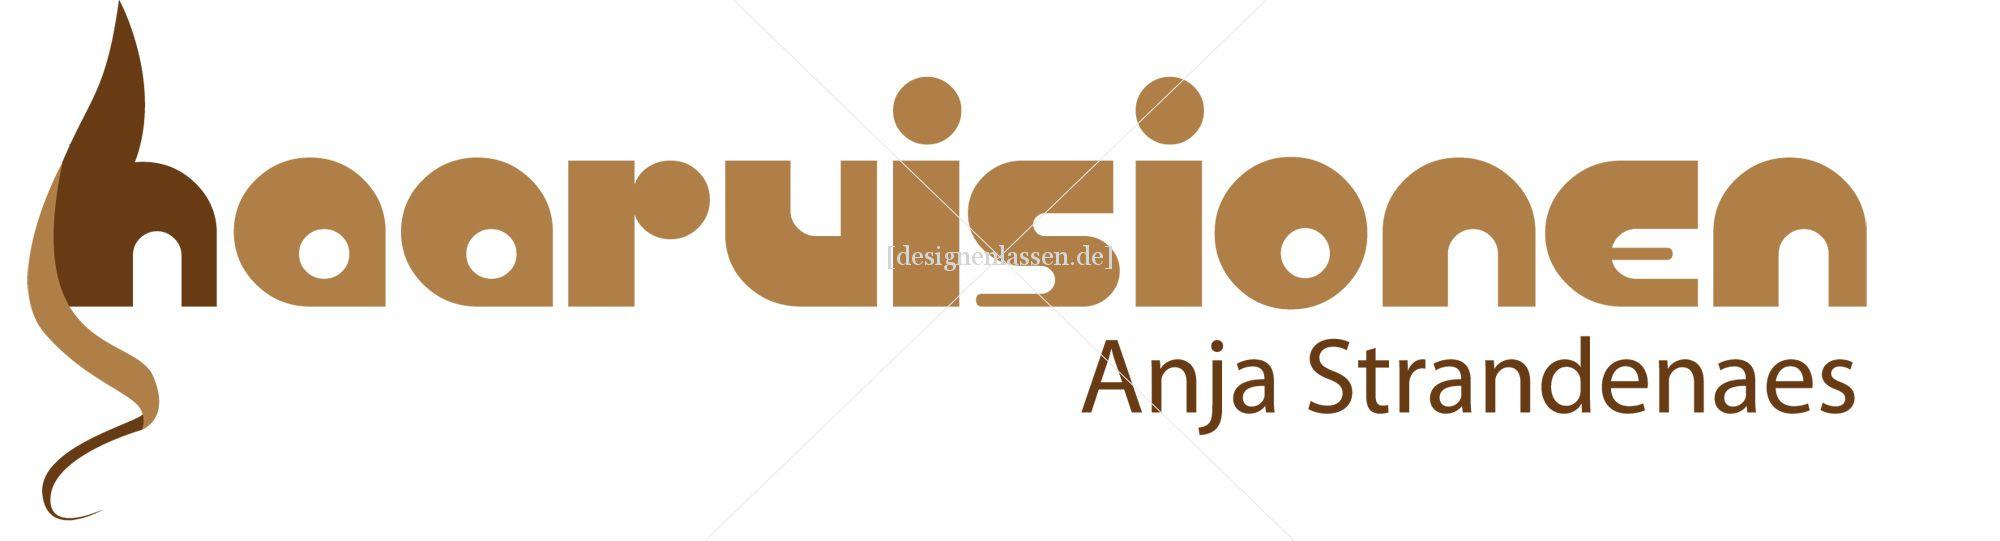 design #119 of Jazz